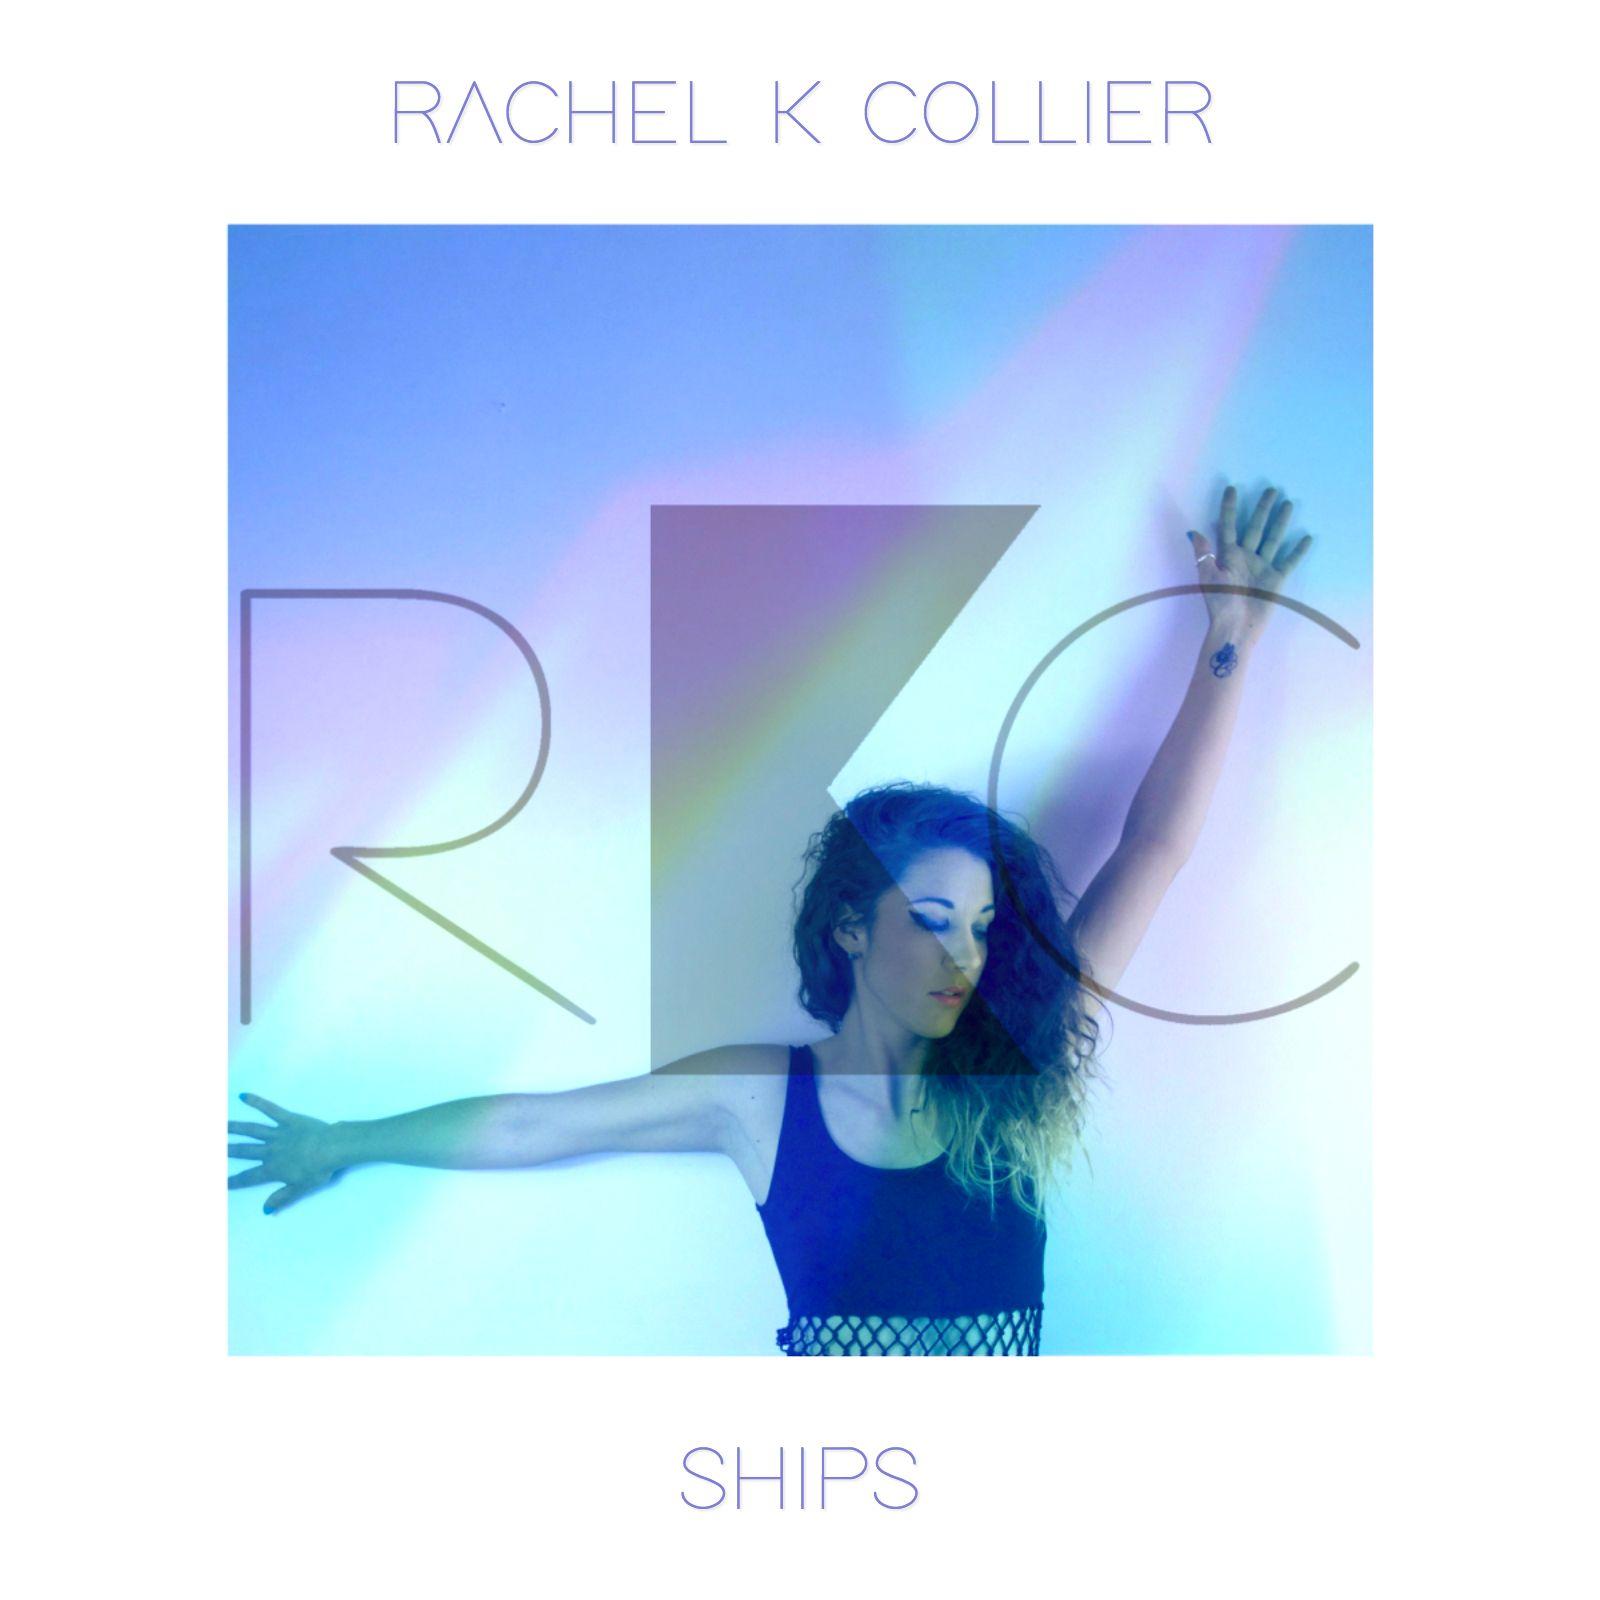 rachel_k_collier_ships.jpg